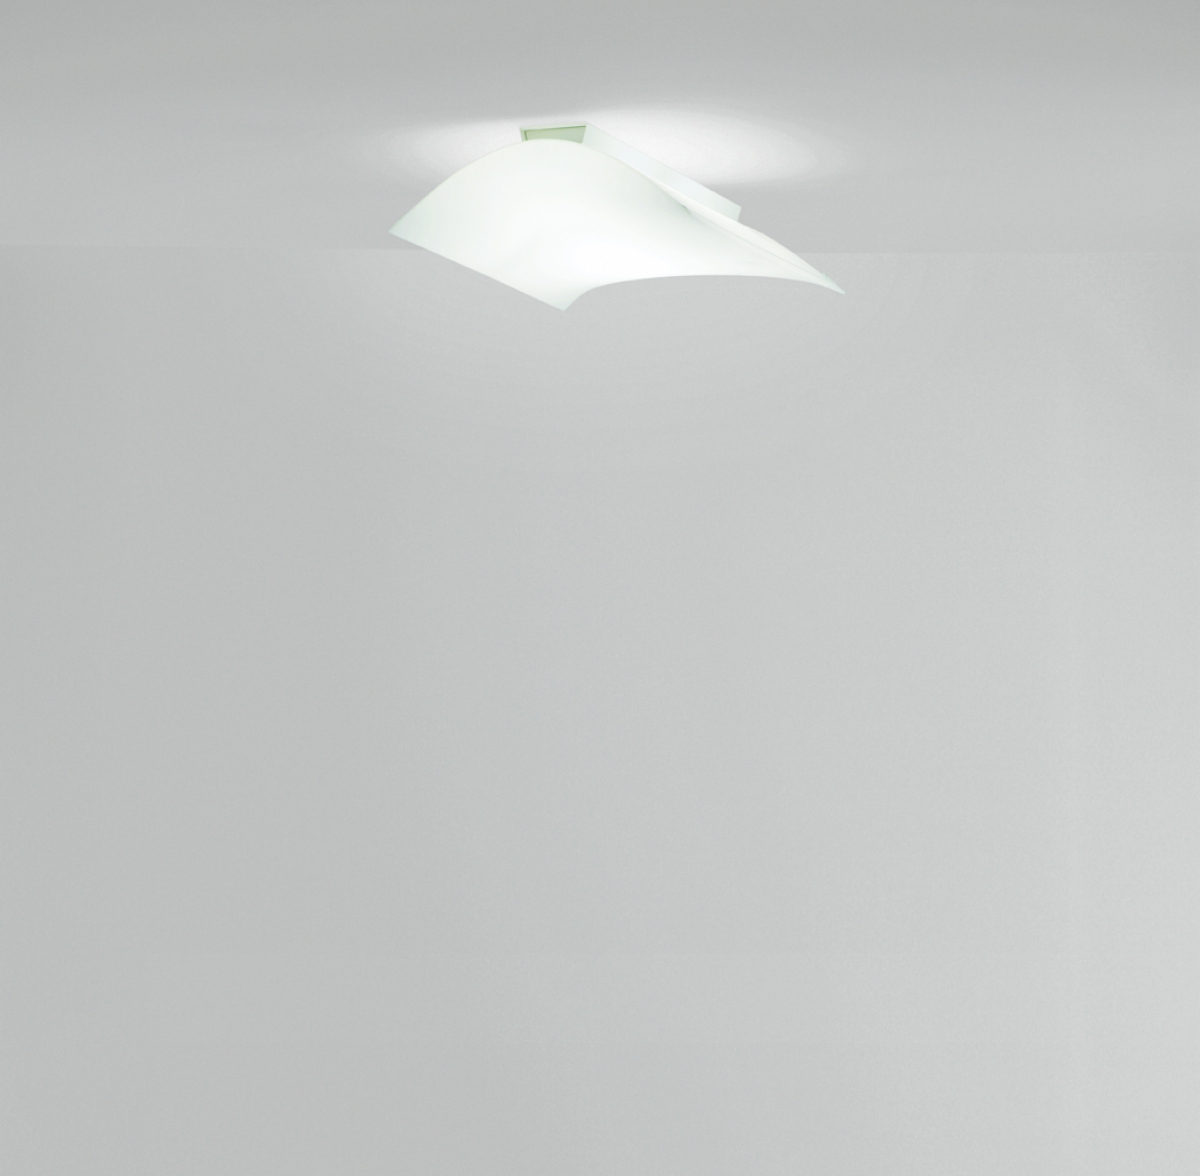 010116-101000-gal-soffittolightvolume05.jpg